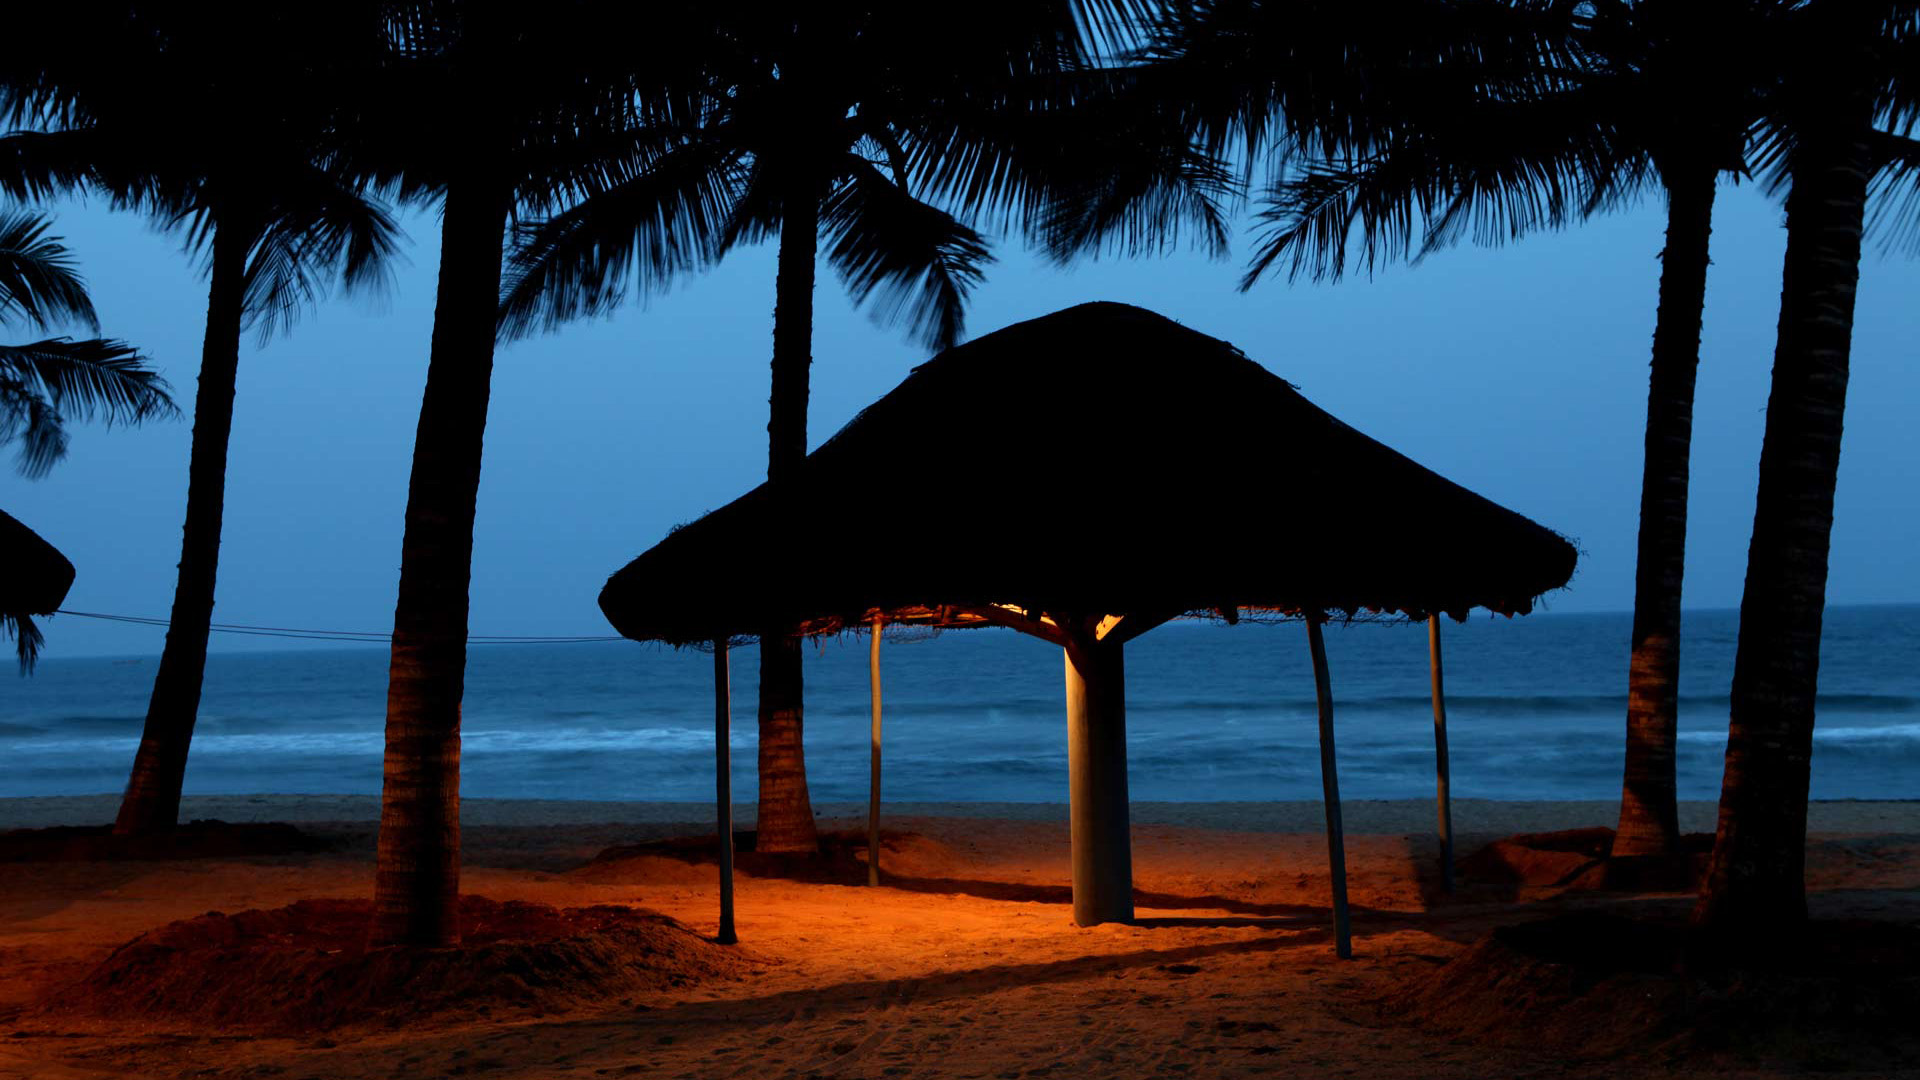 Download Wallpaper Night Beach - Beach-Resort-Wallpaper-41-1920x1080  You Should Have.jpg